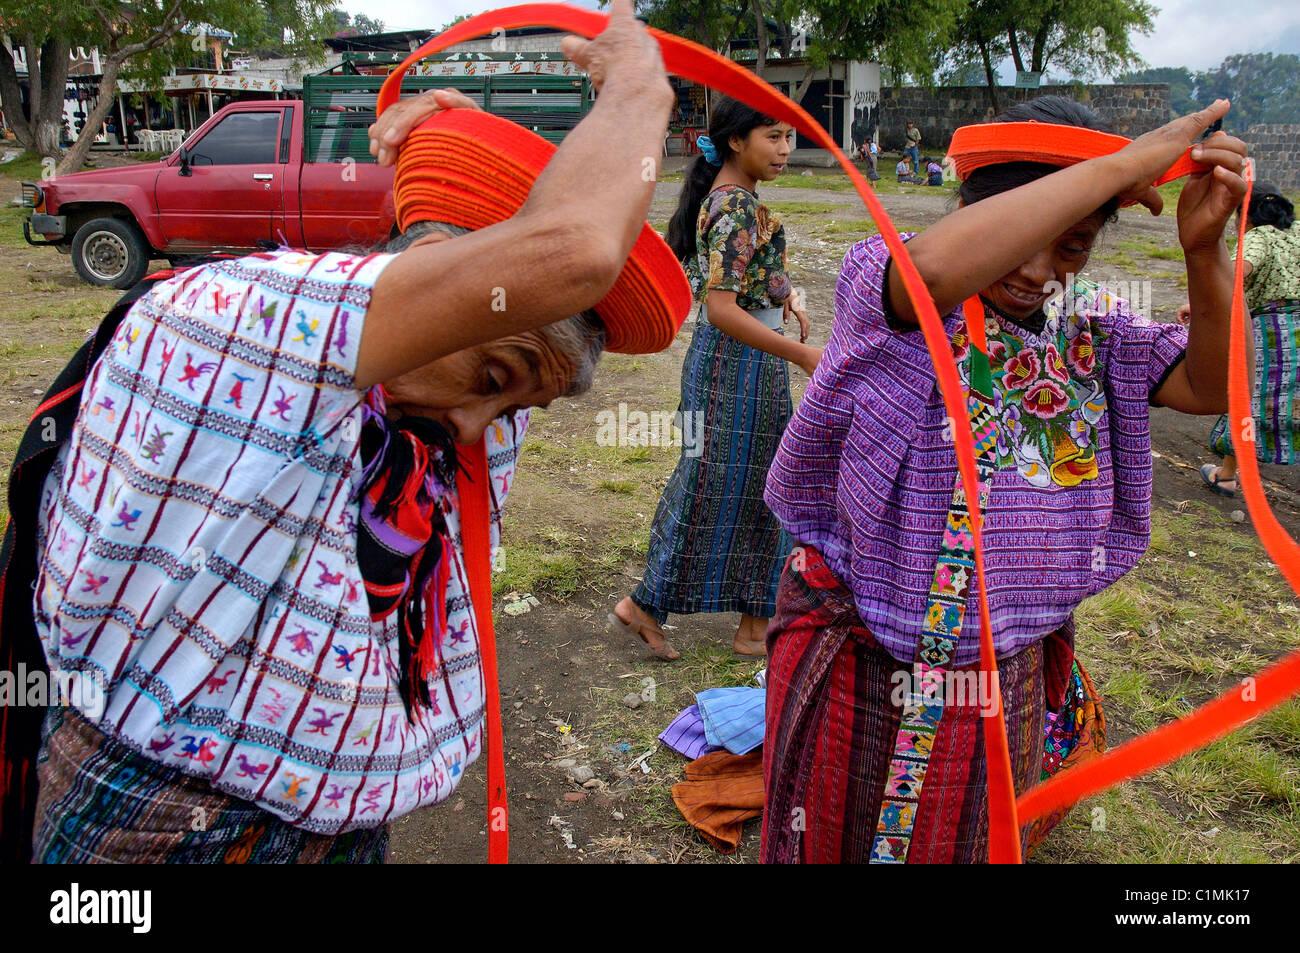 Guatemala Solola Department Santiago Atitlan on Atitlan Lake small city of mostly inhabited by Tzutuhil & Cackchiquels - Stock Image